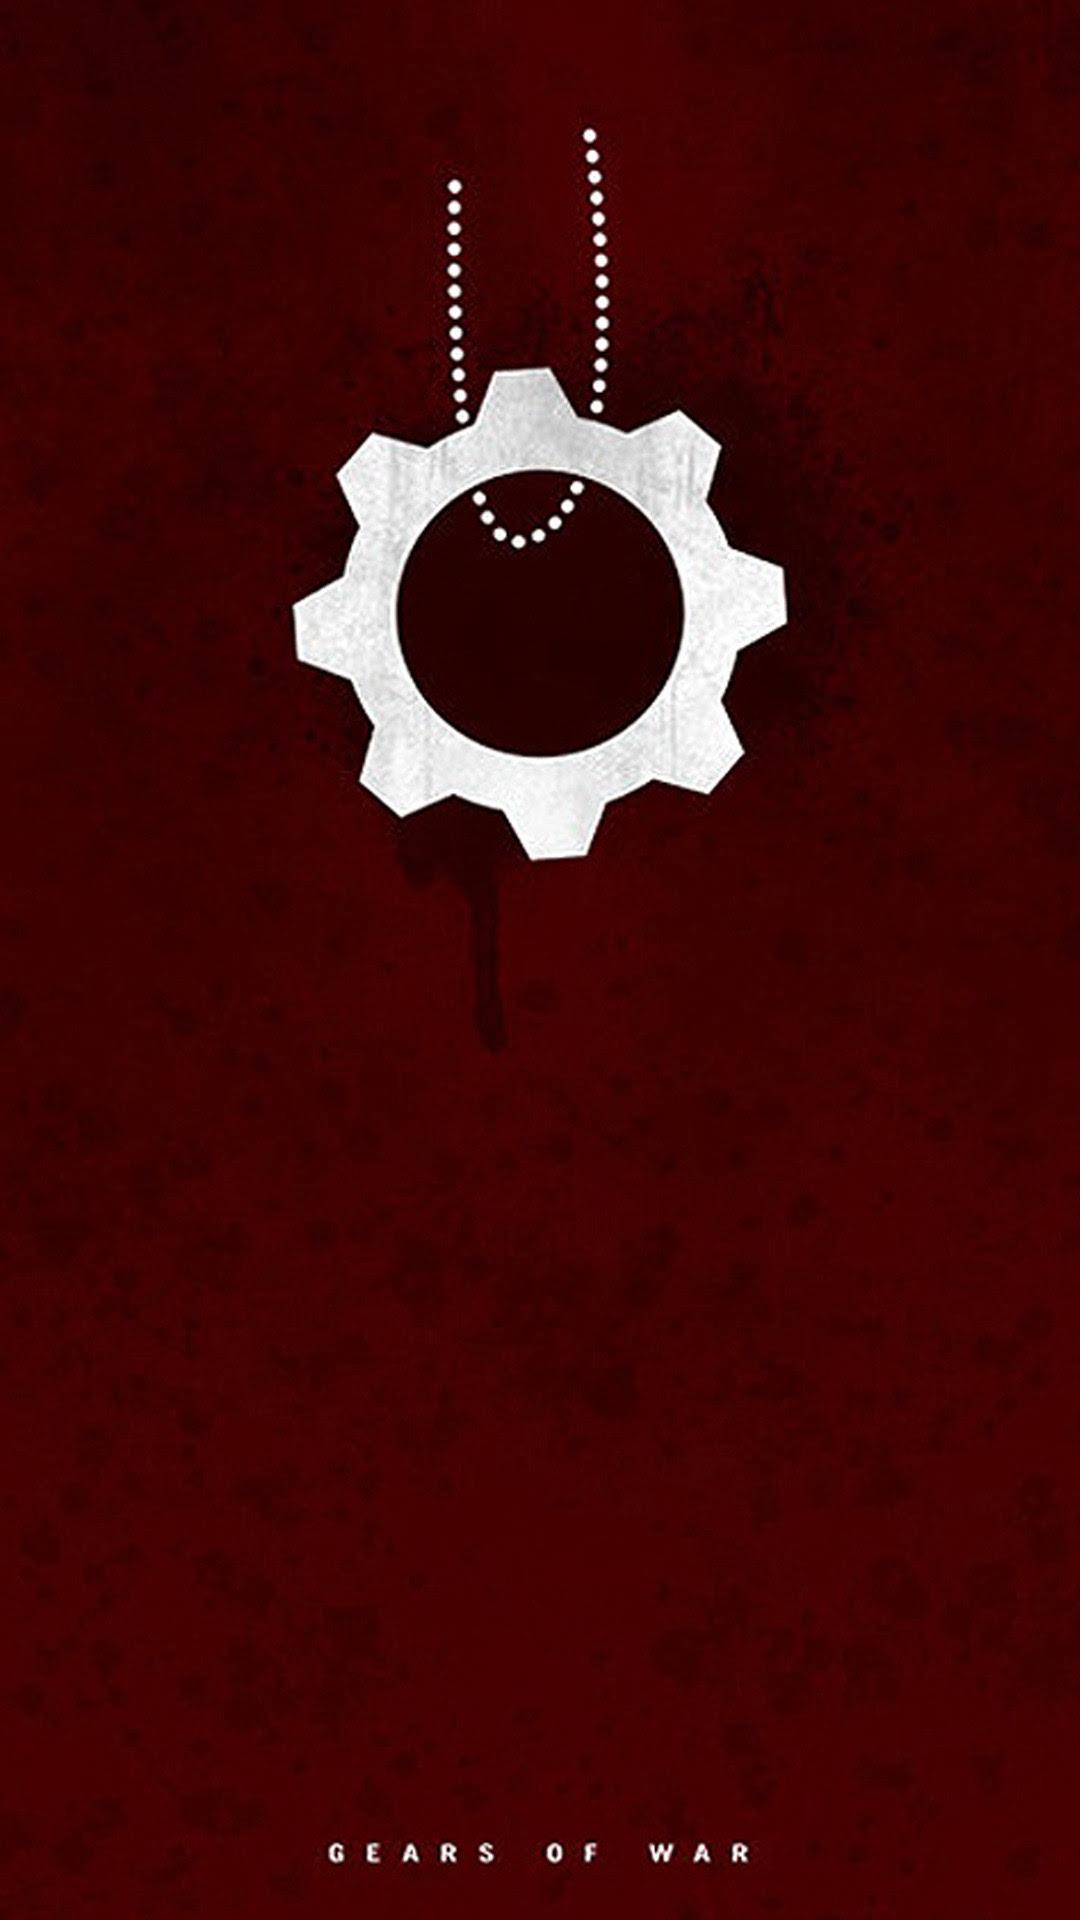 Gears Of War Iphone Wallpaper 70 Images